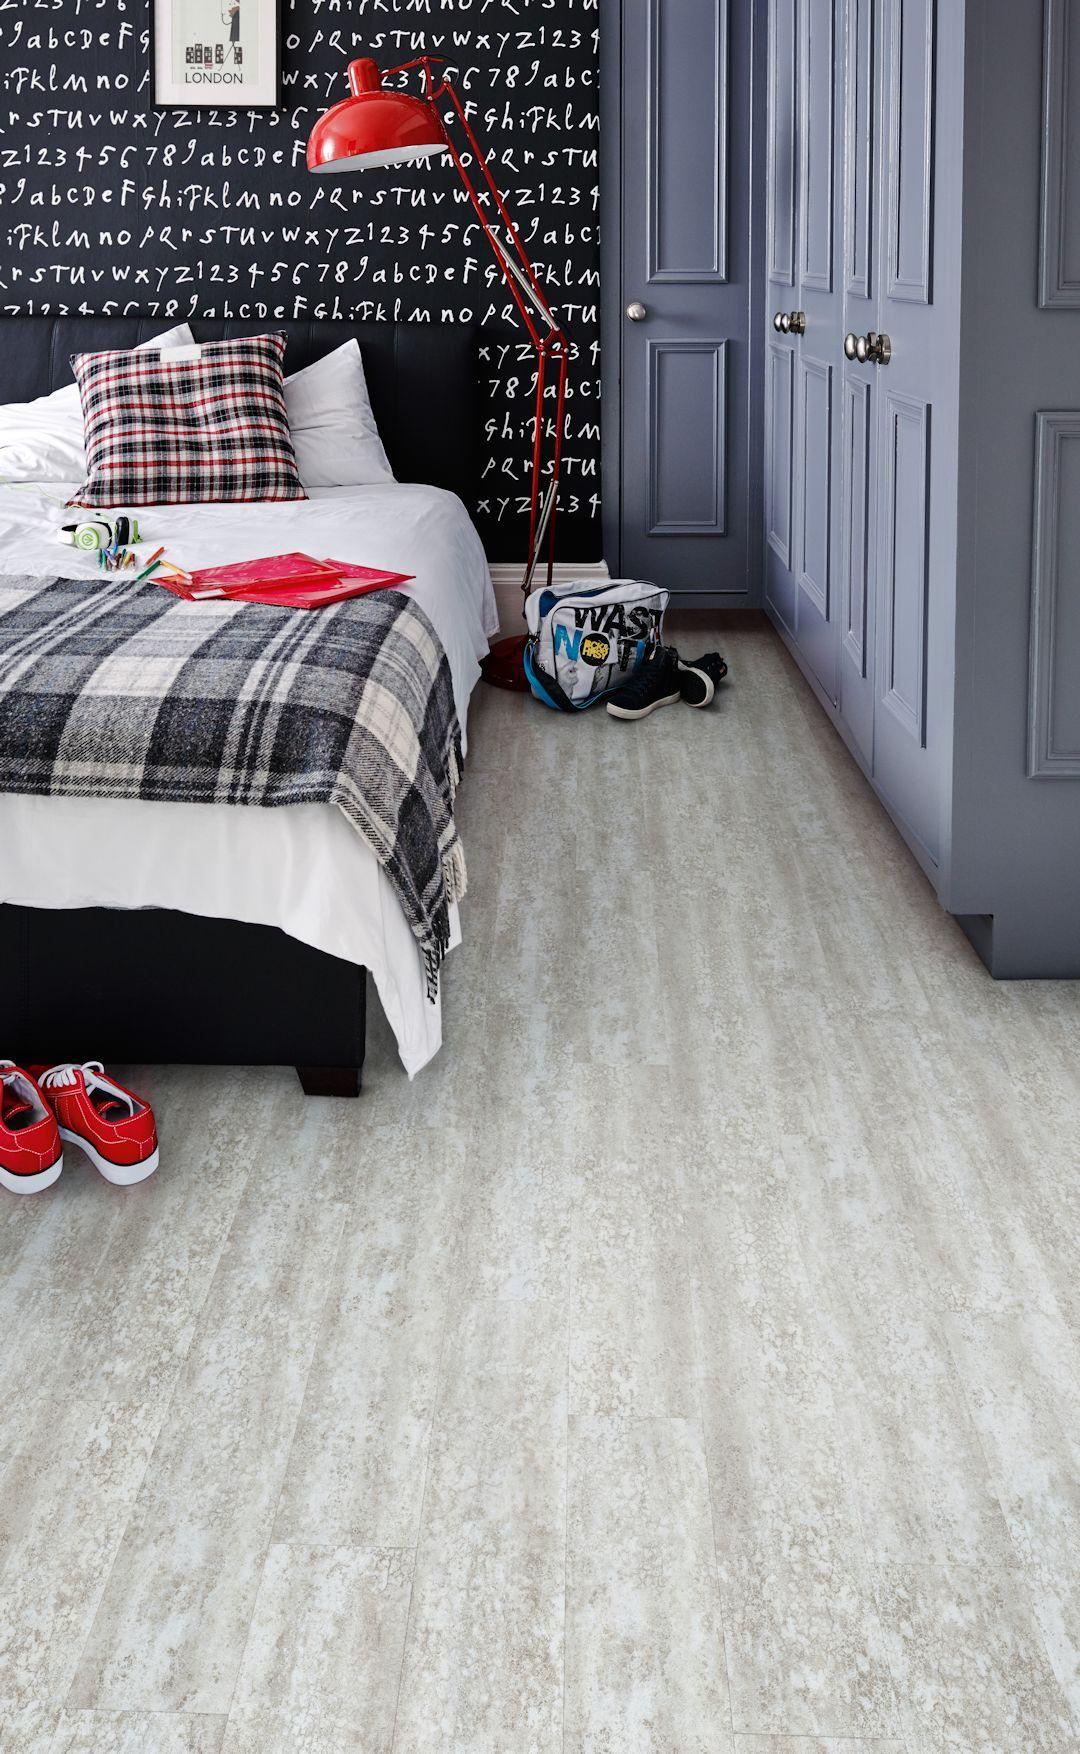 Glacier slate camaro luxury vinyl tile flooring featured in glacier slate camaro luxury vinyl tile flooring featured in bedroom dailygadgetfo Image collections